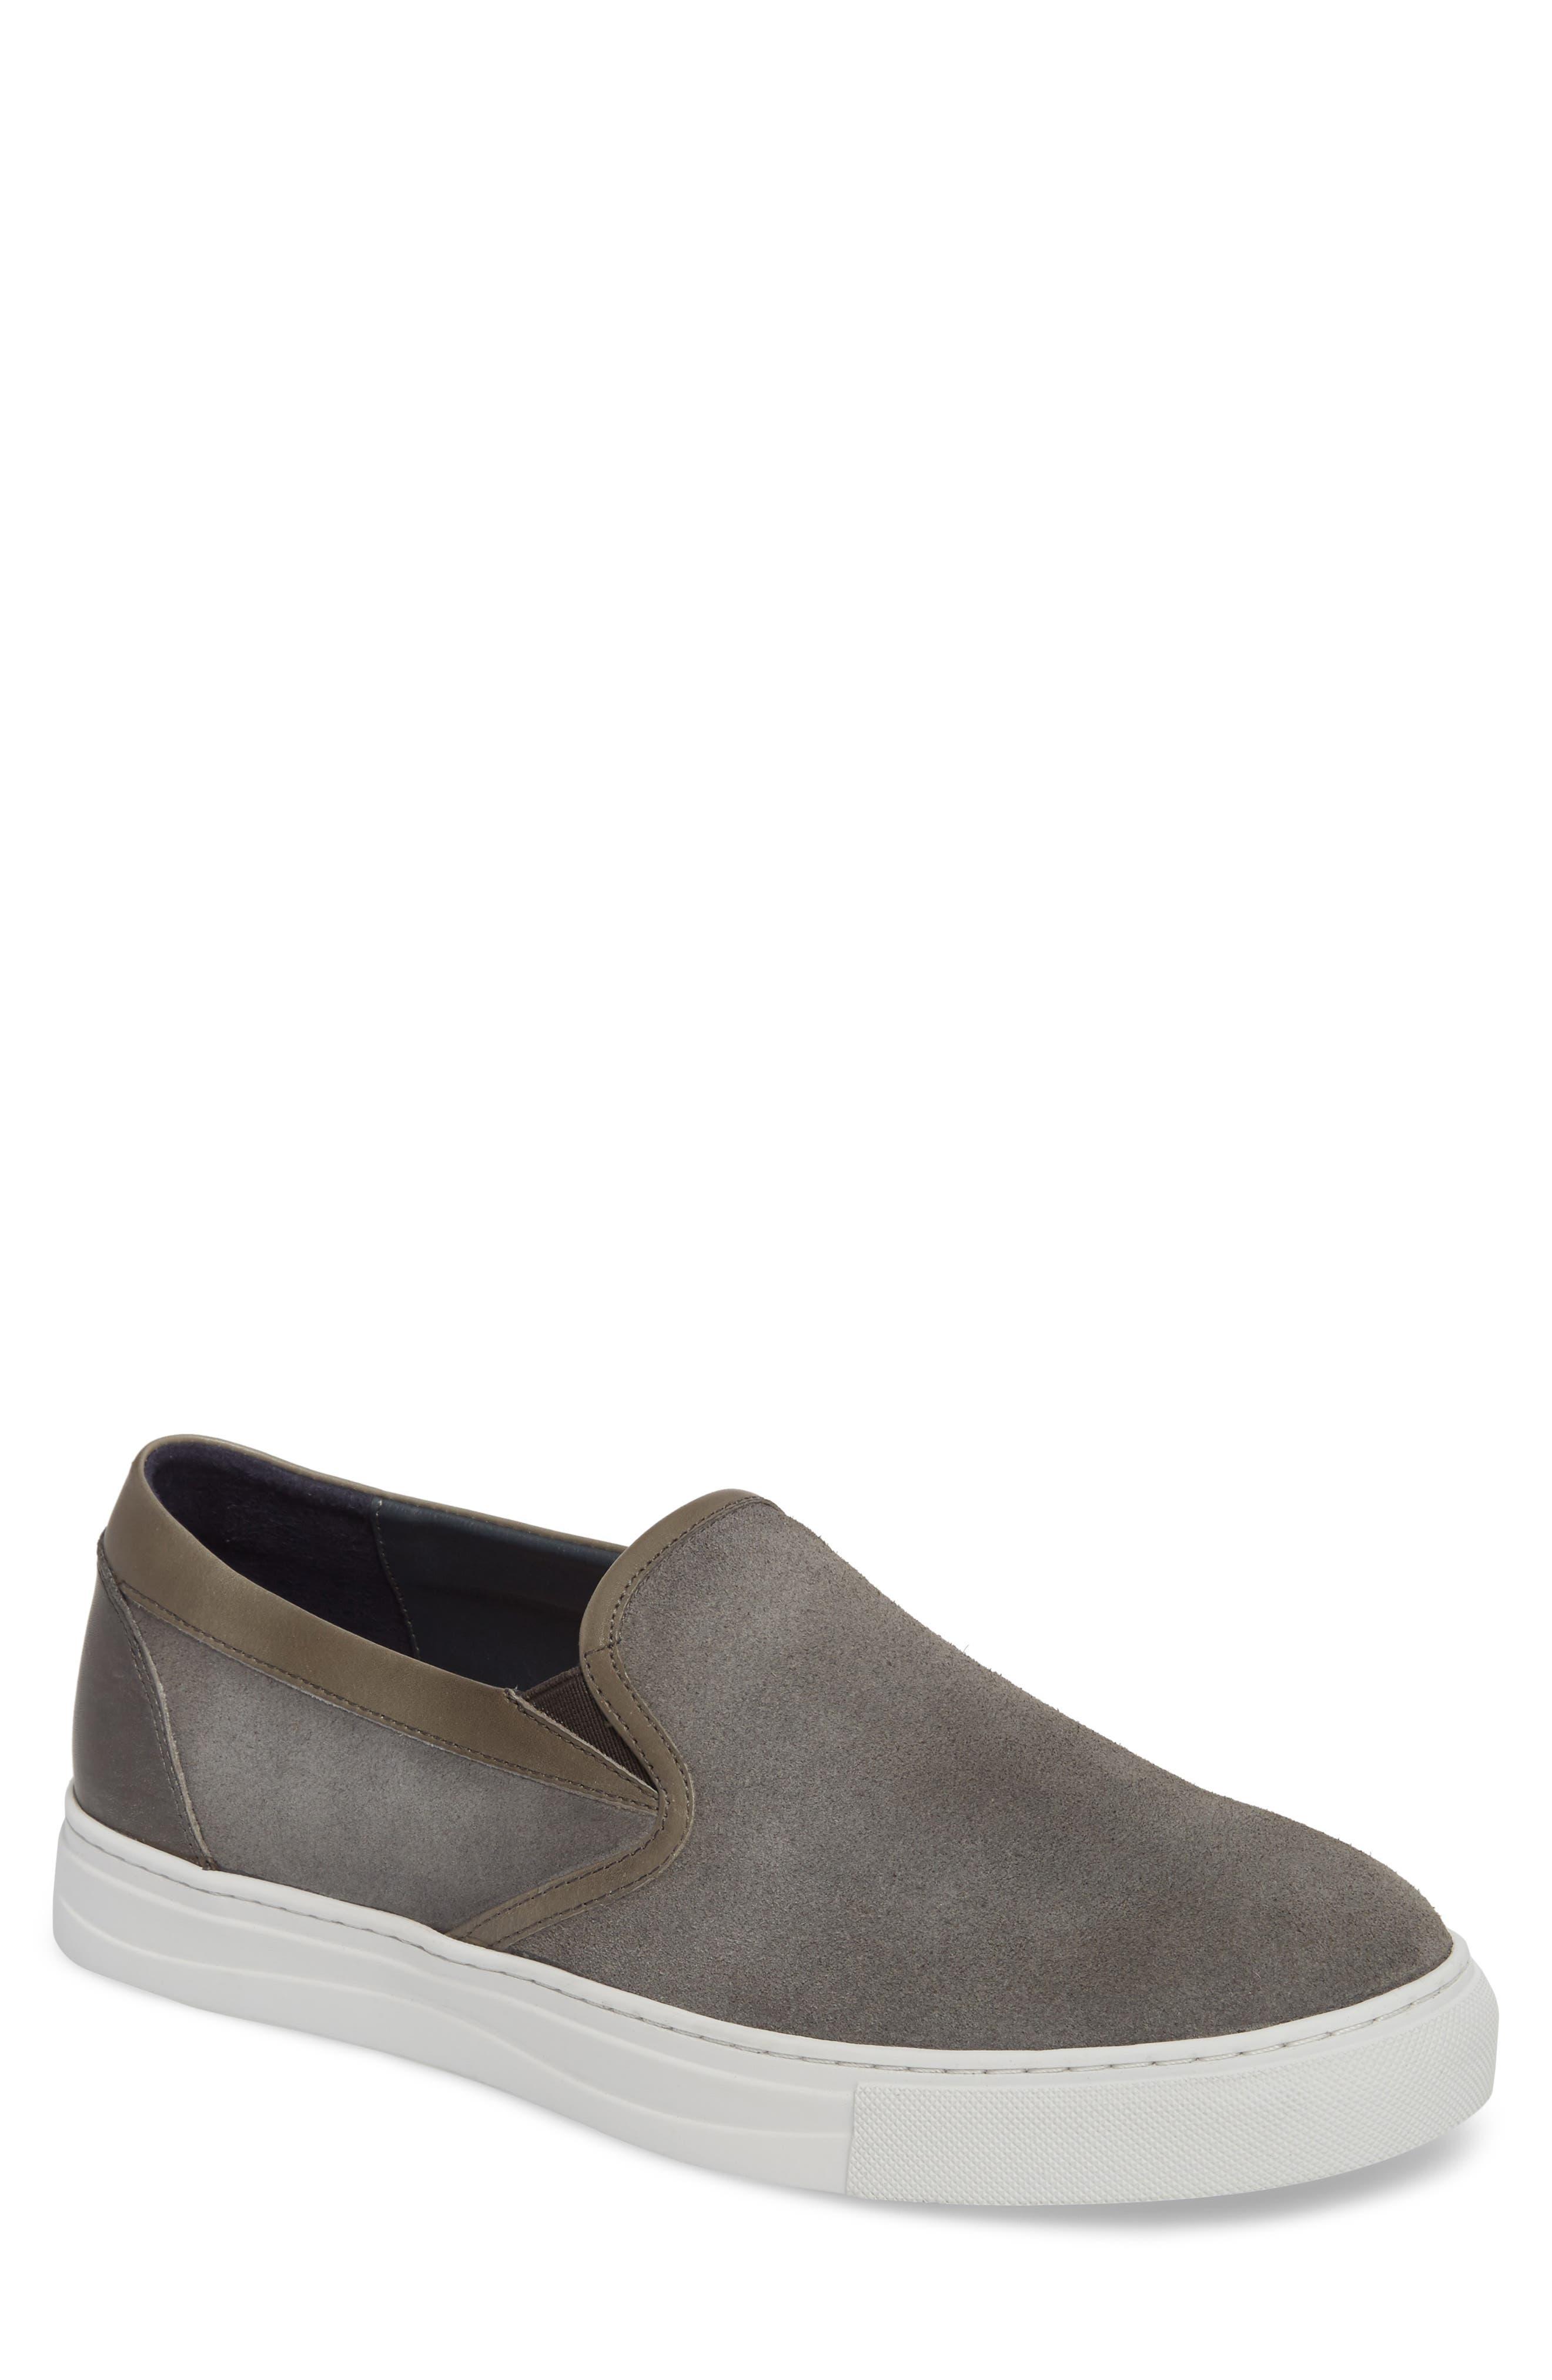 Vane Slip-On Sneaker,                         Main,                         color, GREY SUEDE/ LEATHER